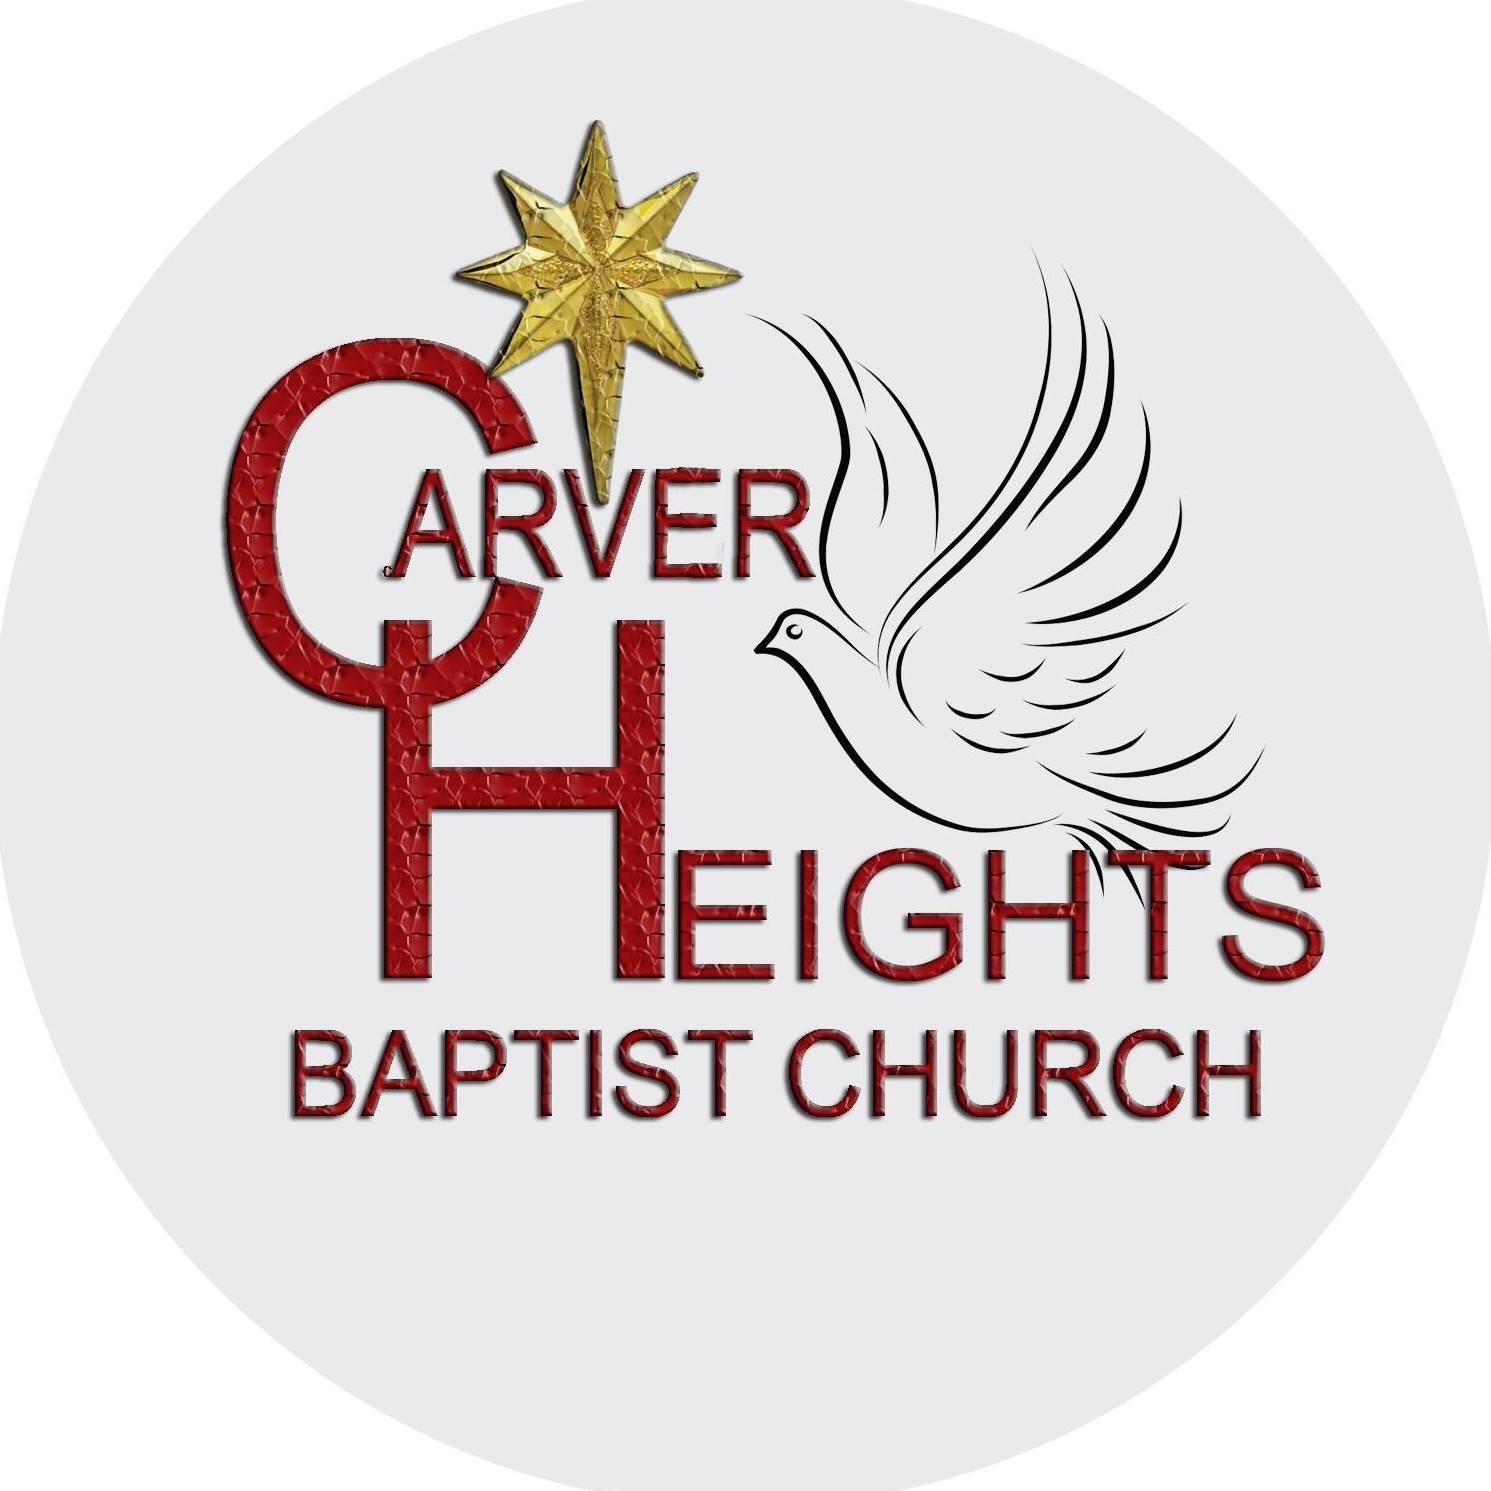 Carver Heights Baptist Church